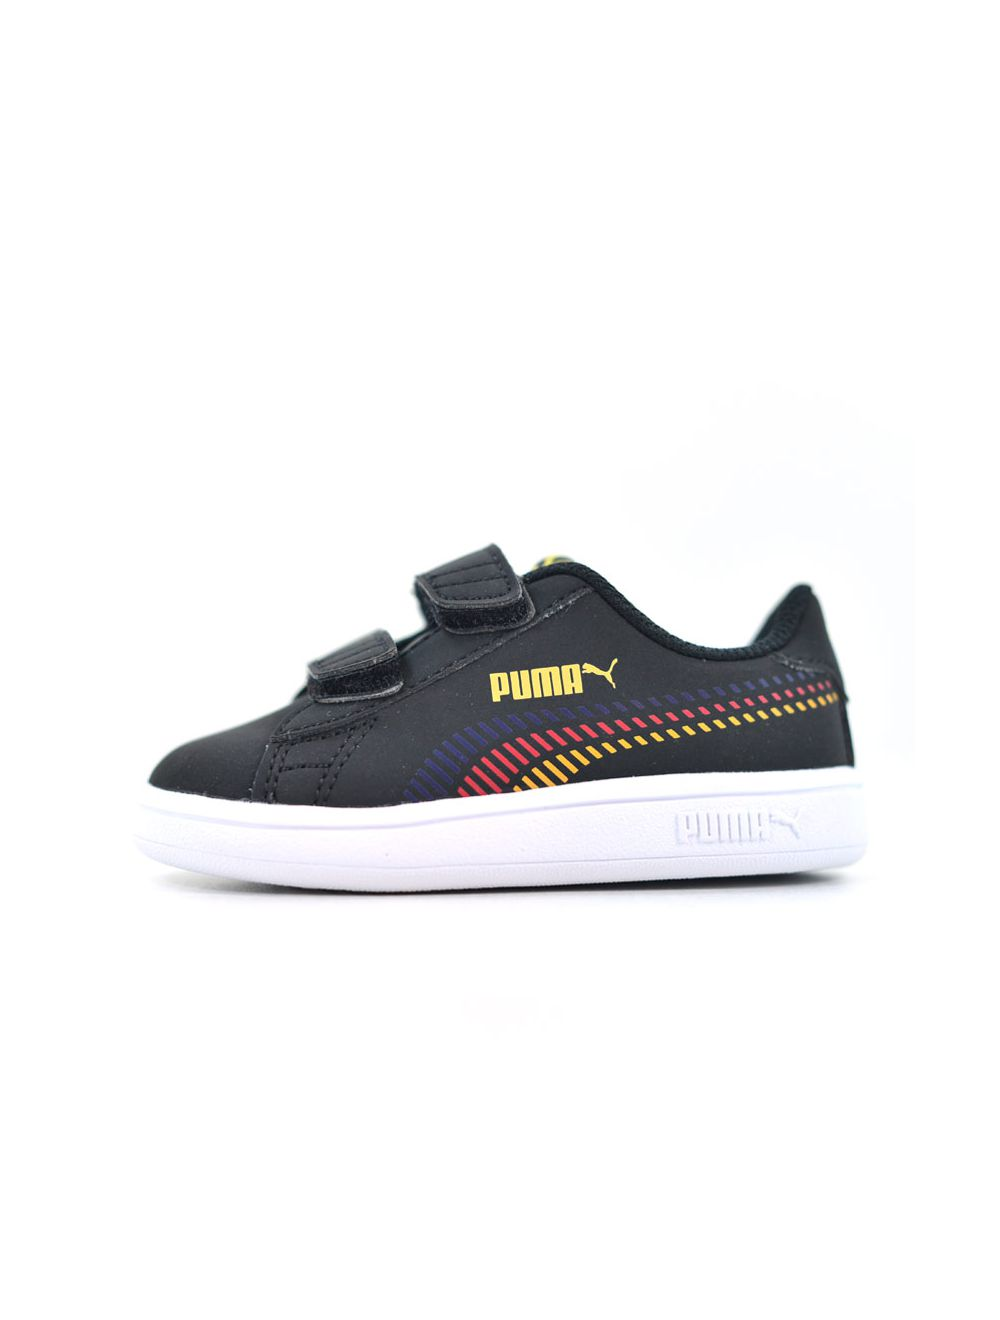 Puma Smash V2 Buck Toddler Sneaker Black